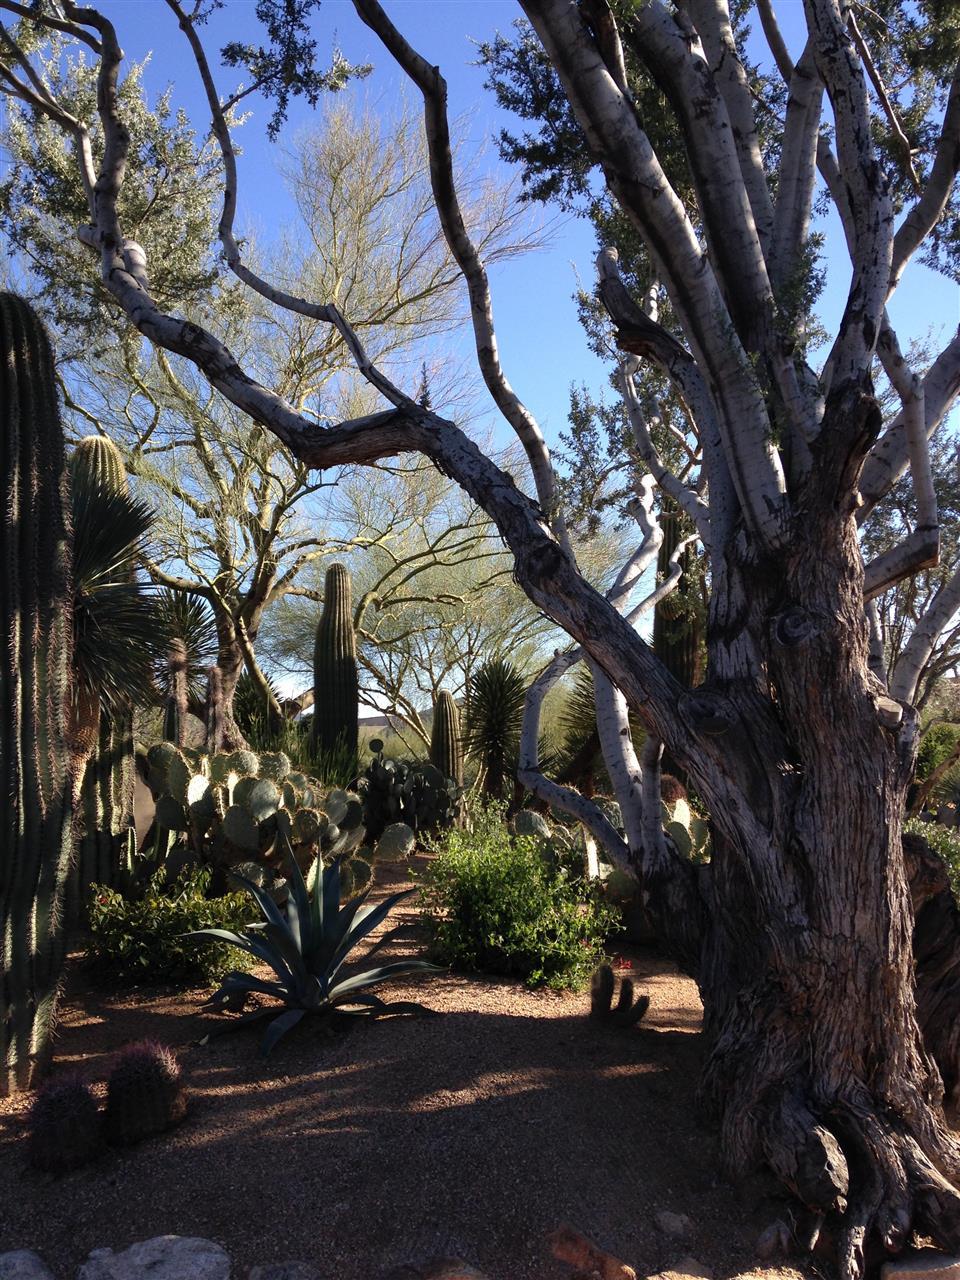 A stately ironwood tree guards the desert in Desert Highlands, Scottsdale, AZ.